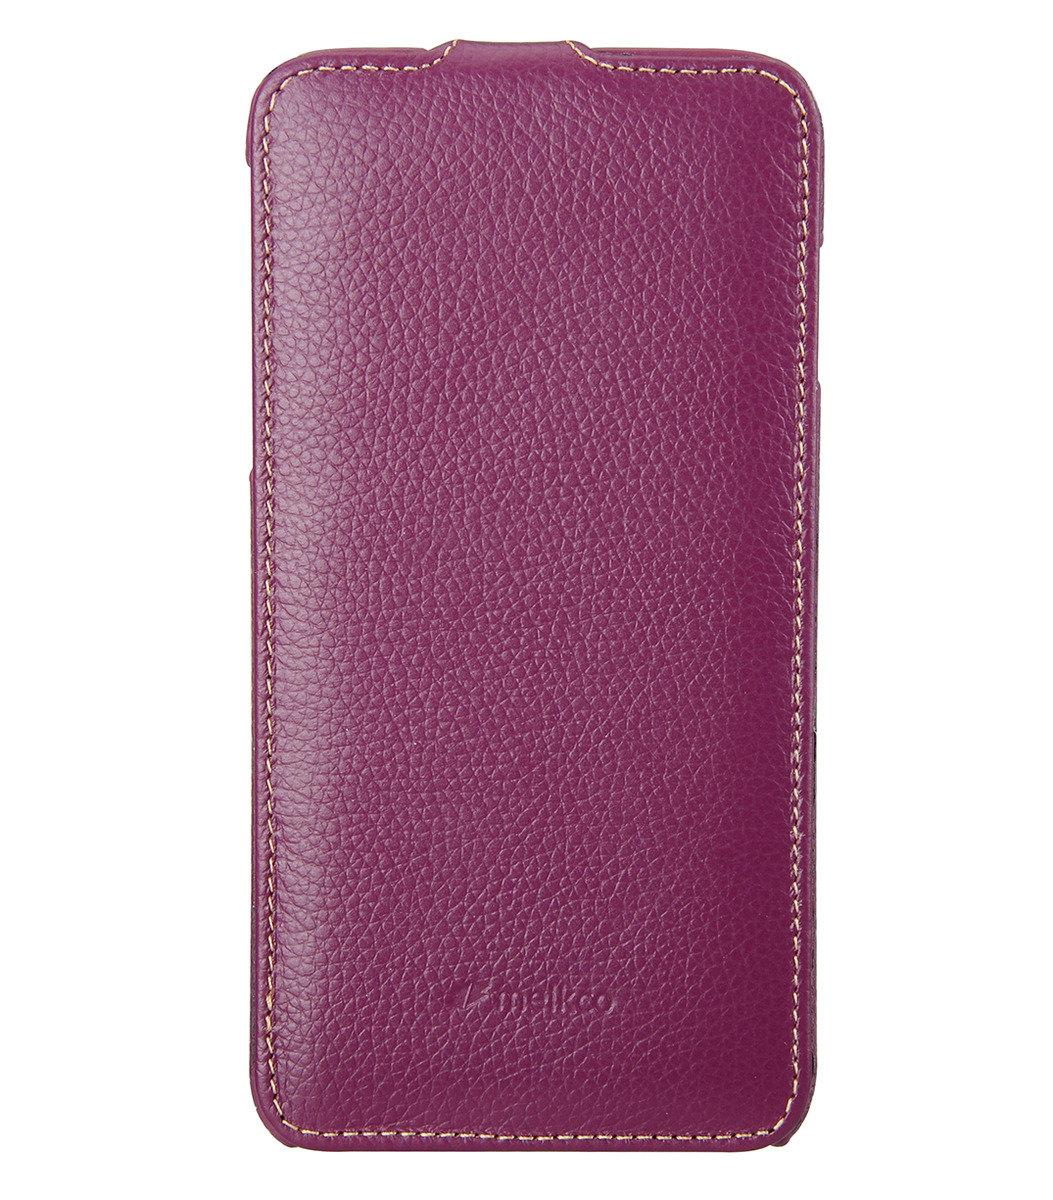 Apple iPhone 6 Plus/6s Plus  (5.5'') Jacka Type 高級真皮革手機套 (紫色荔枝條紋)